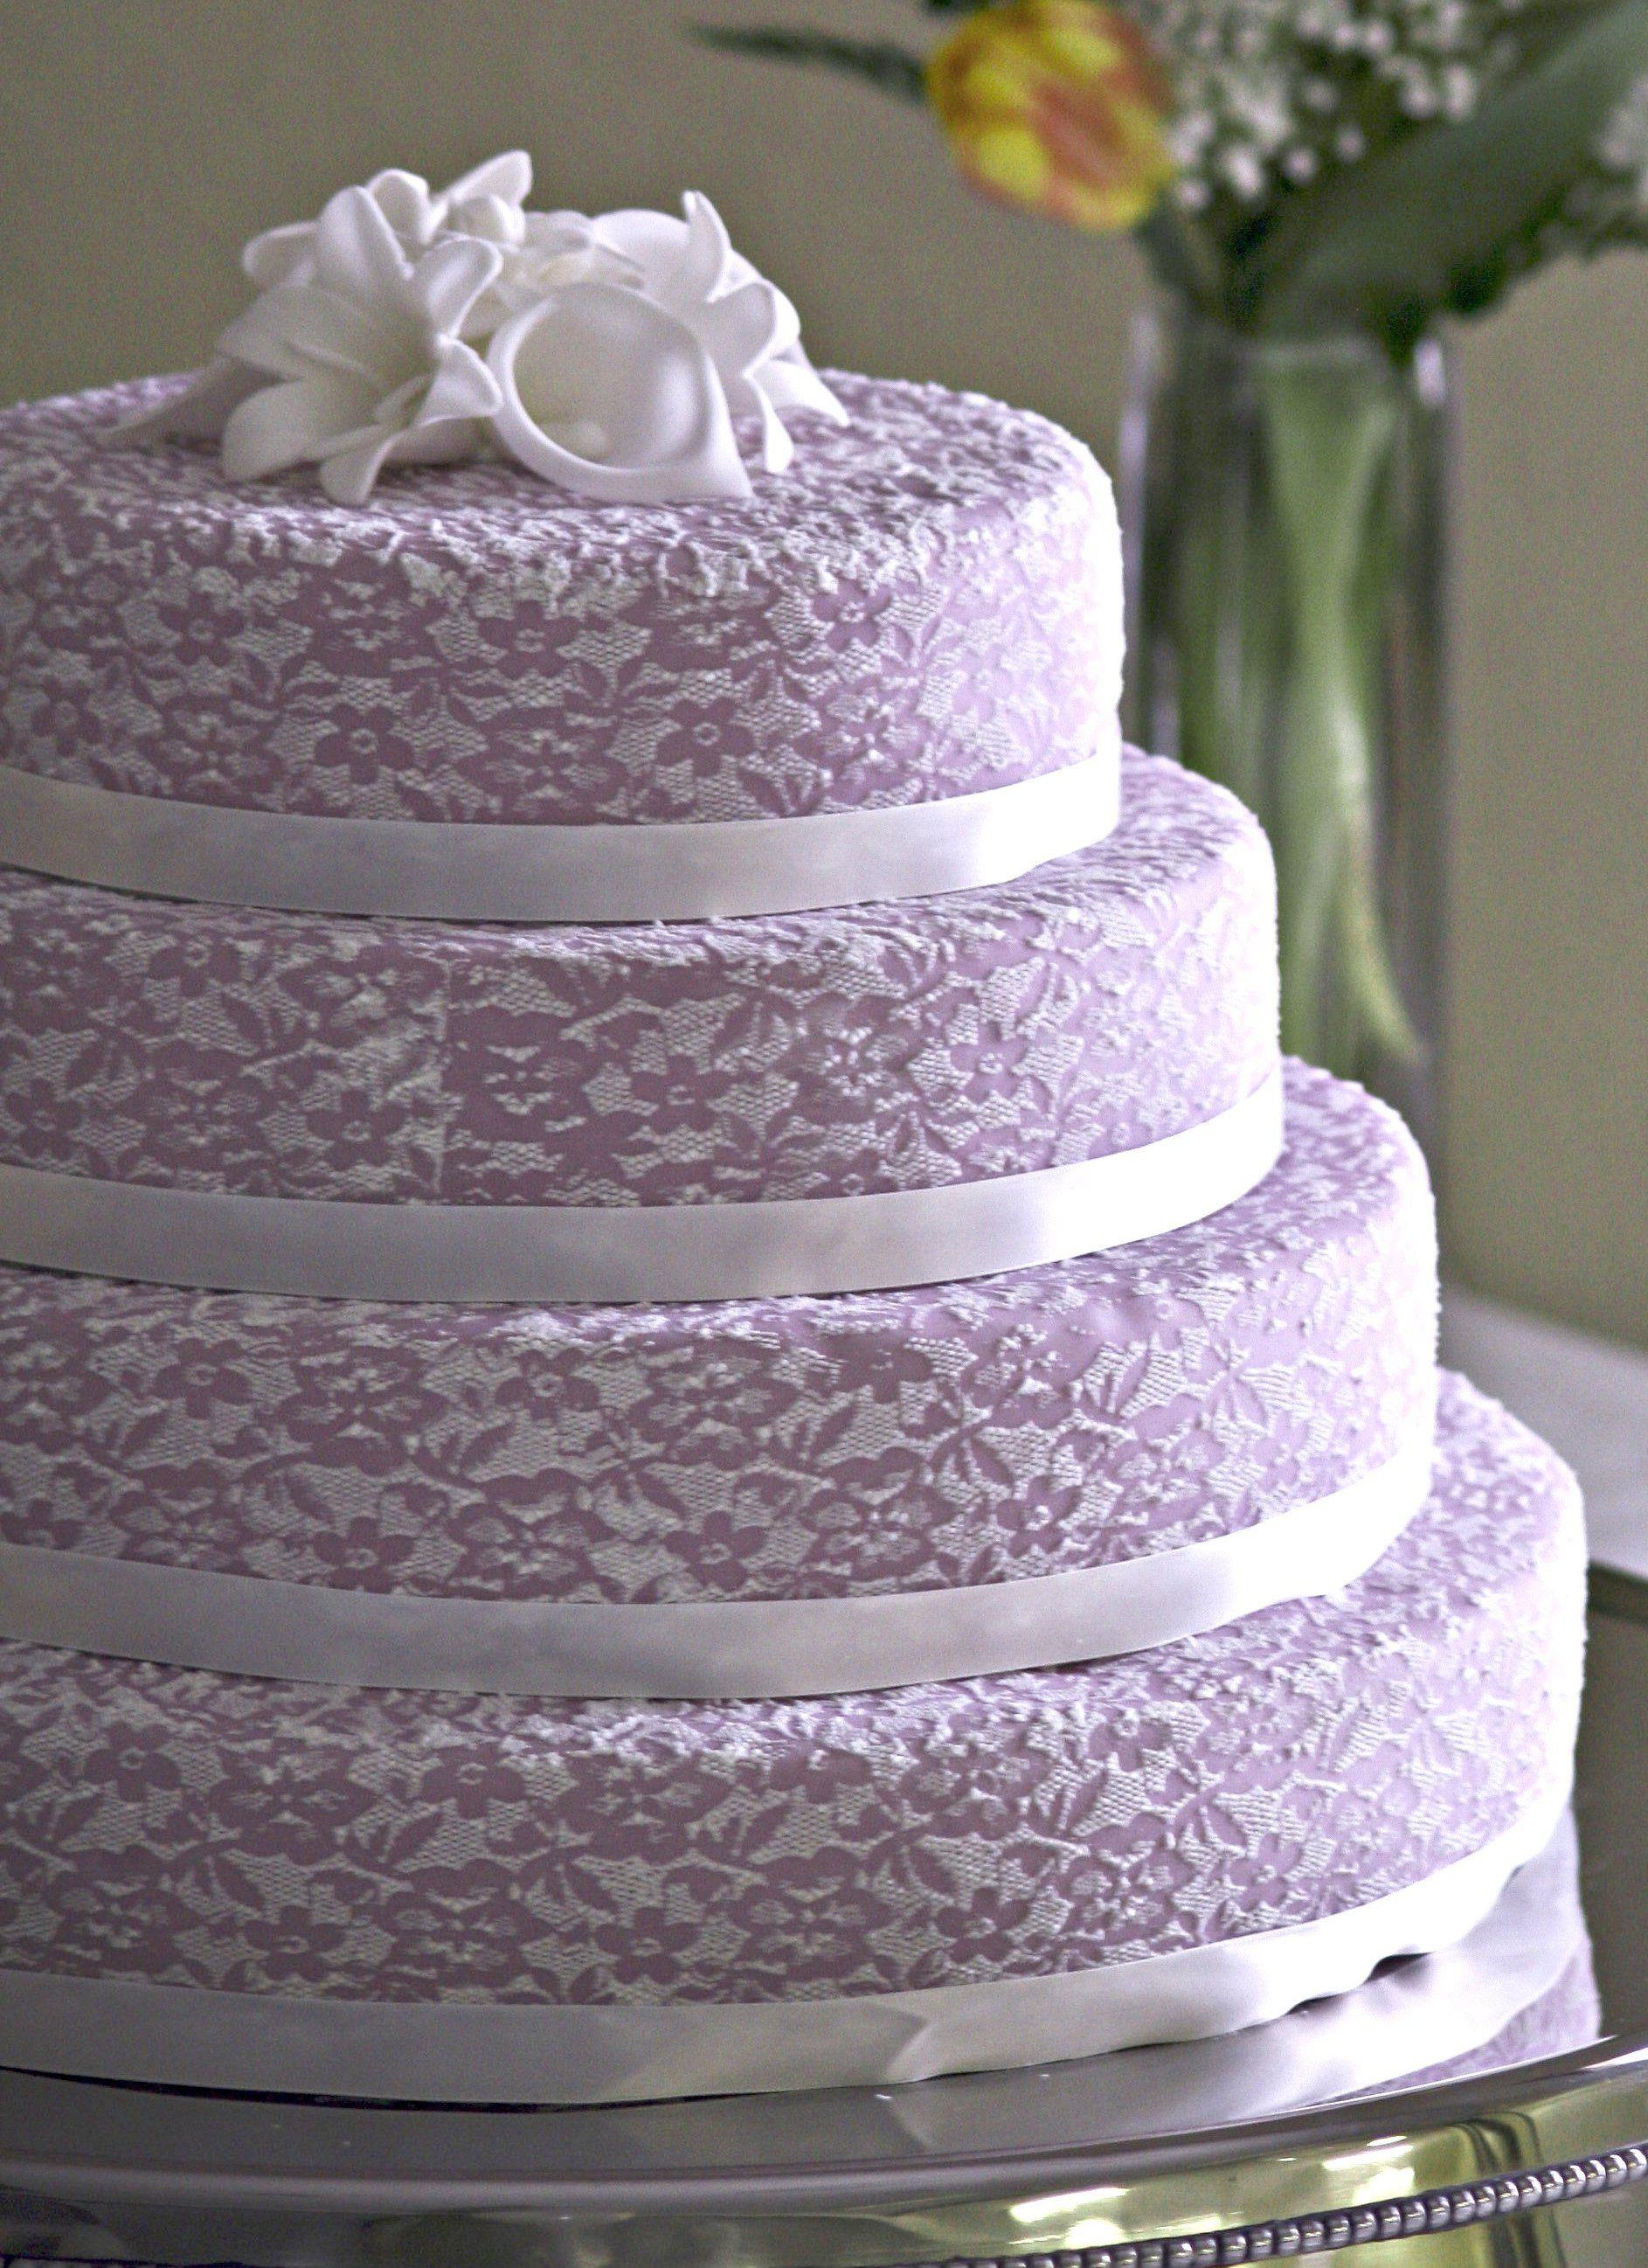 Best fondant wedding cake recipe